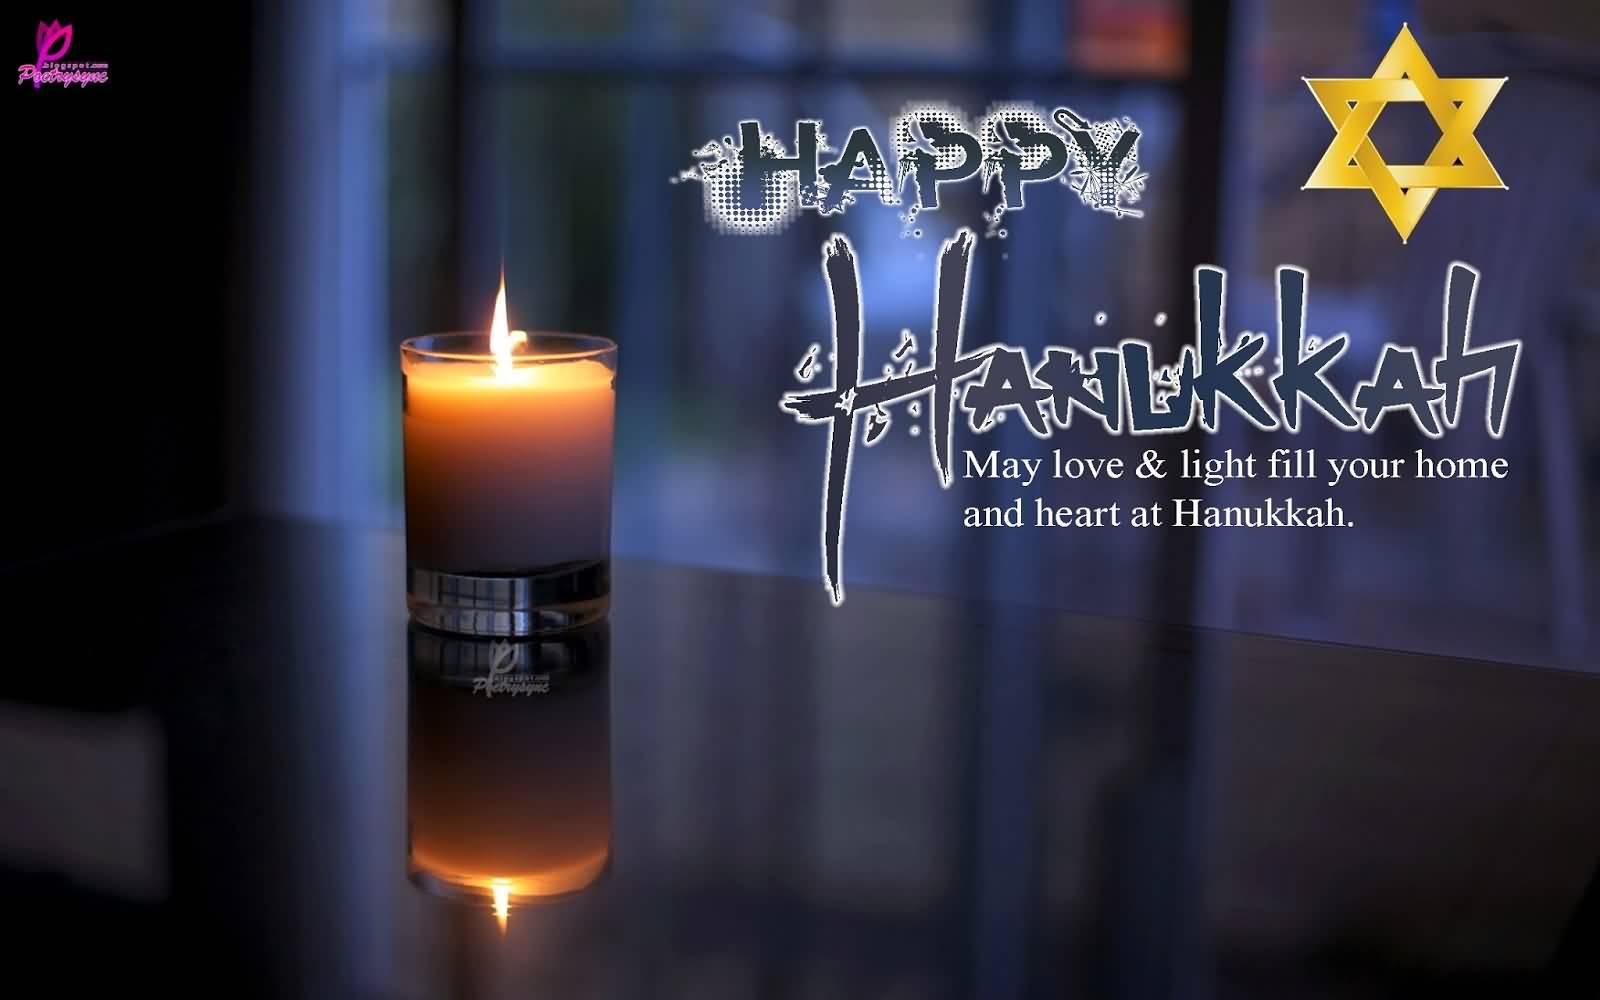 65 beautiful hanukkah greeting pictures happy hanukkah may love light fill your home and heart at hanukkah m4hsunfo